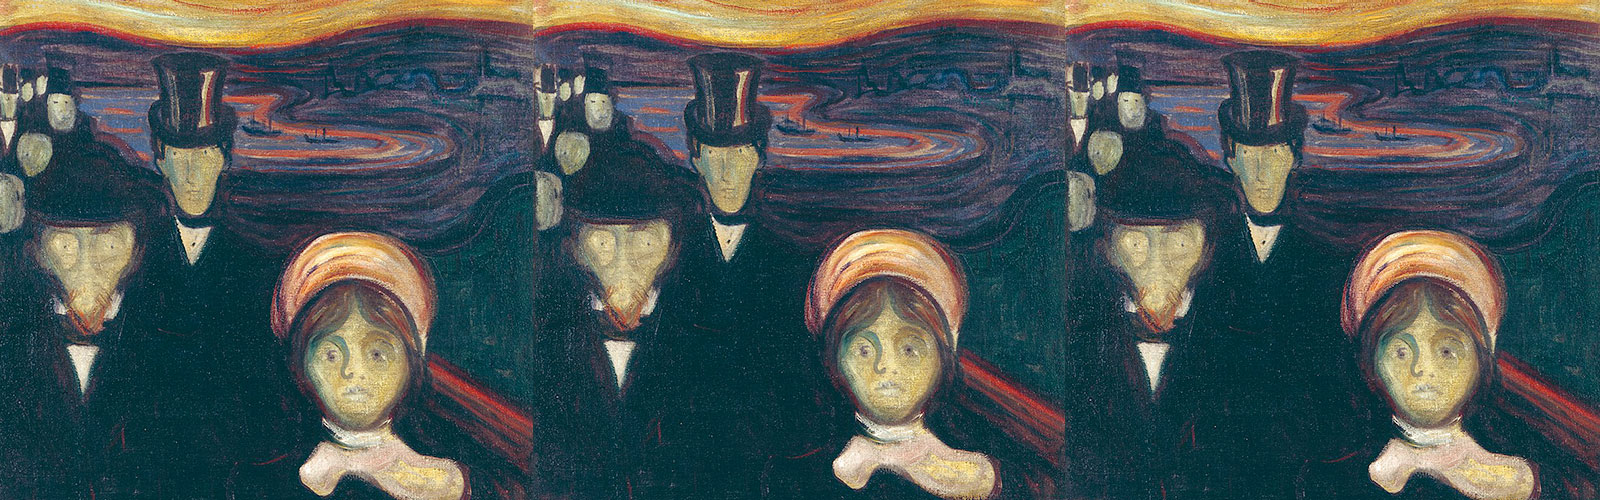 L'ansia - Edvard Munch